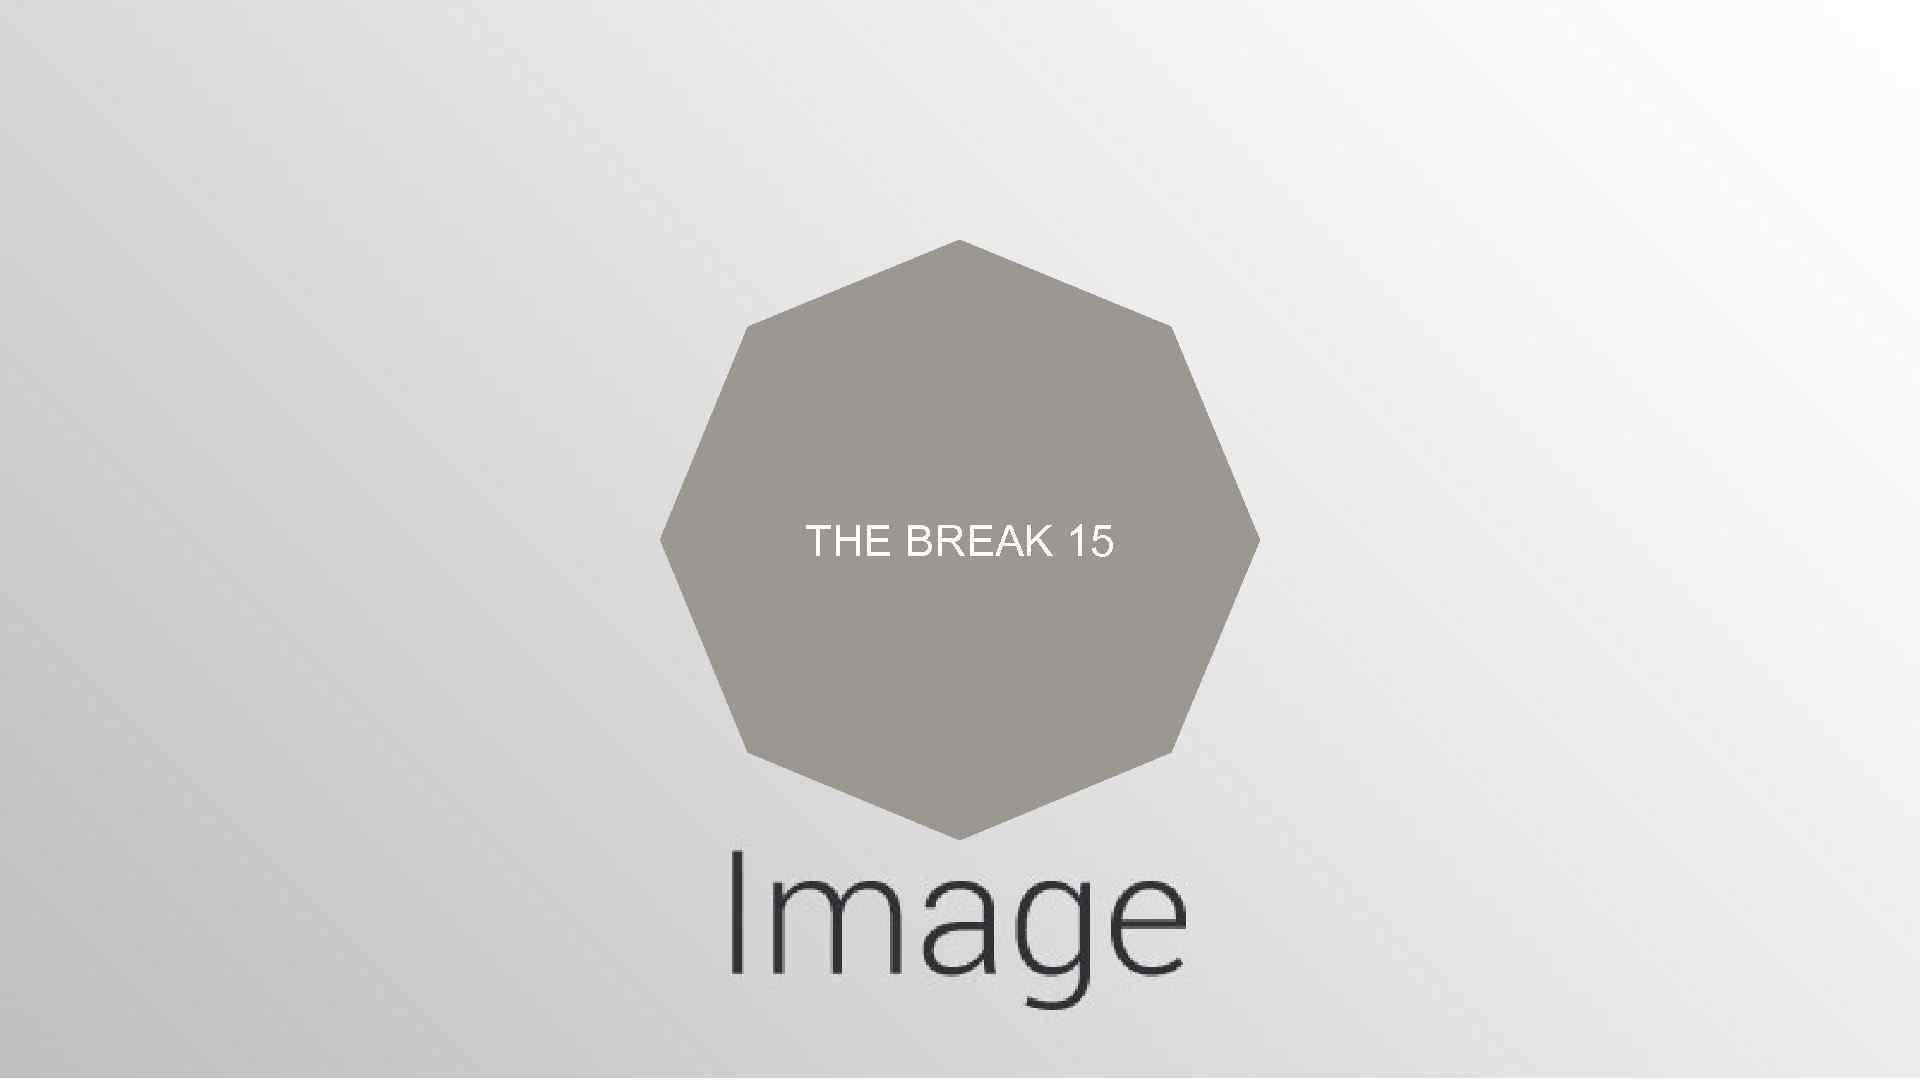 THE BREAK 15